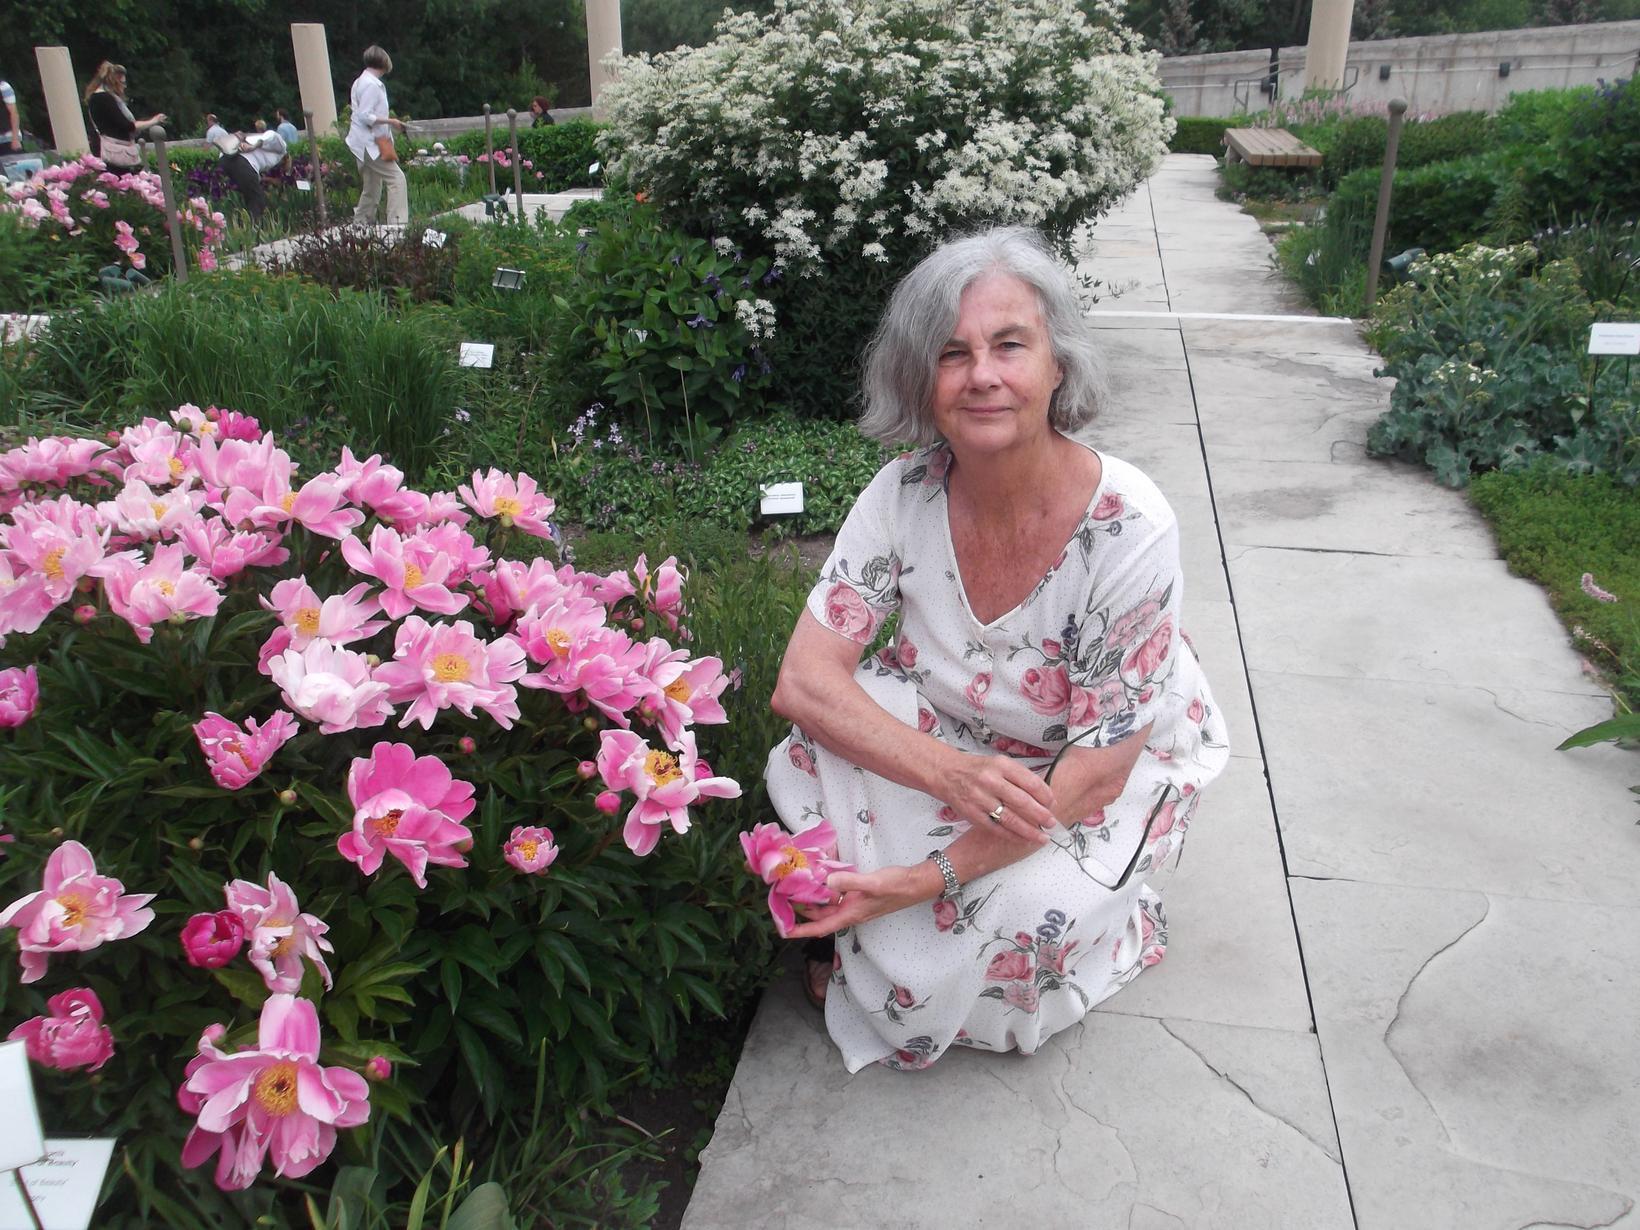 Lynn from London, Ontario, Canada